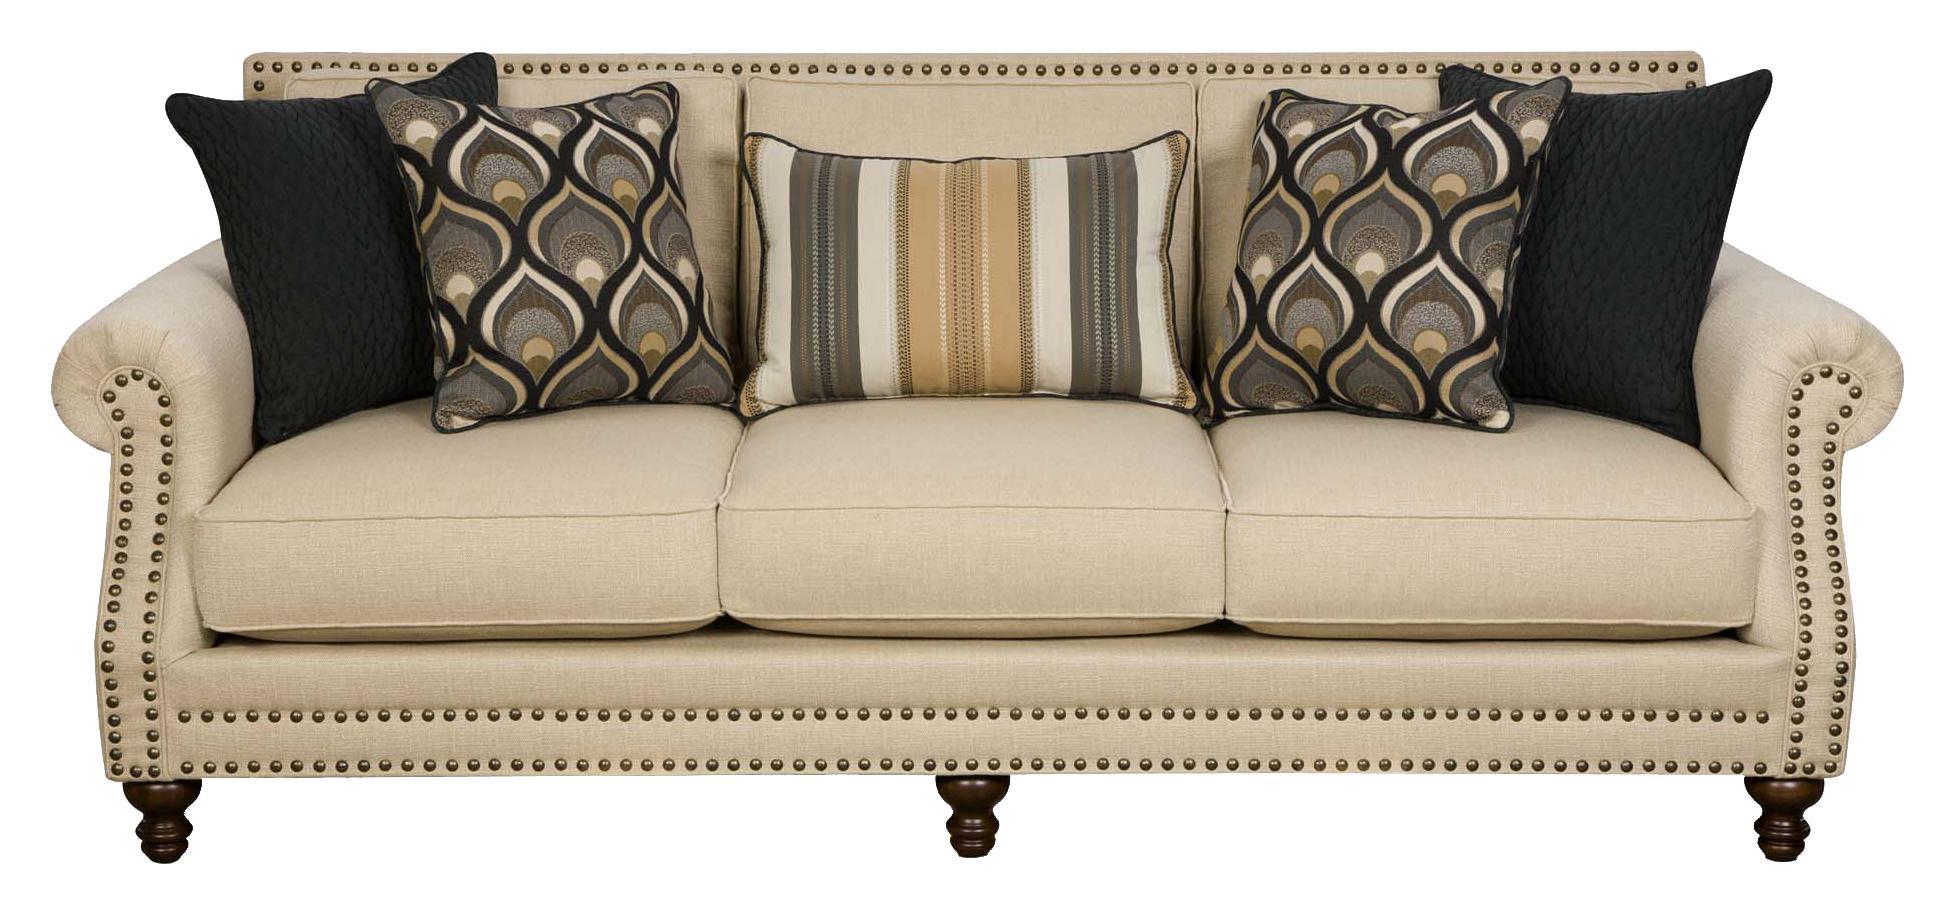 Corinthian 84A0 Oatfield Sofa - Item Number: 84A3